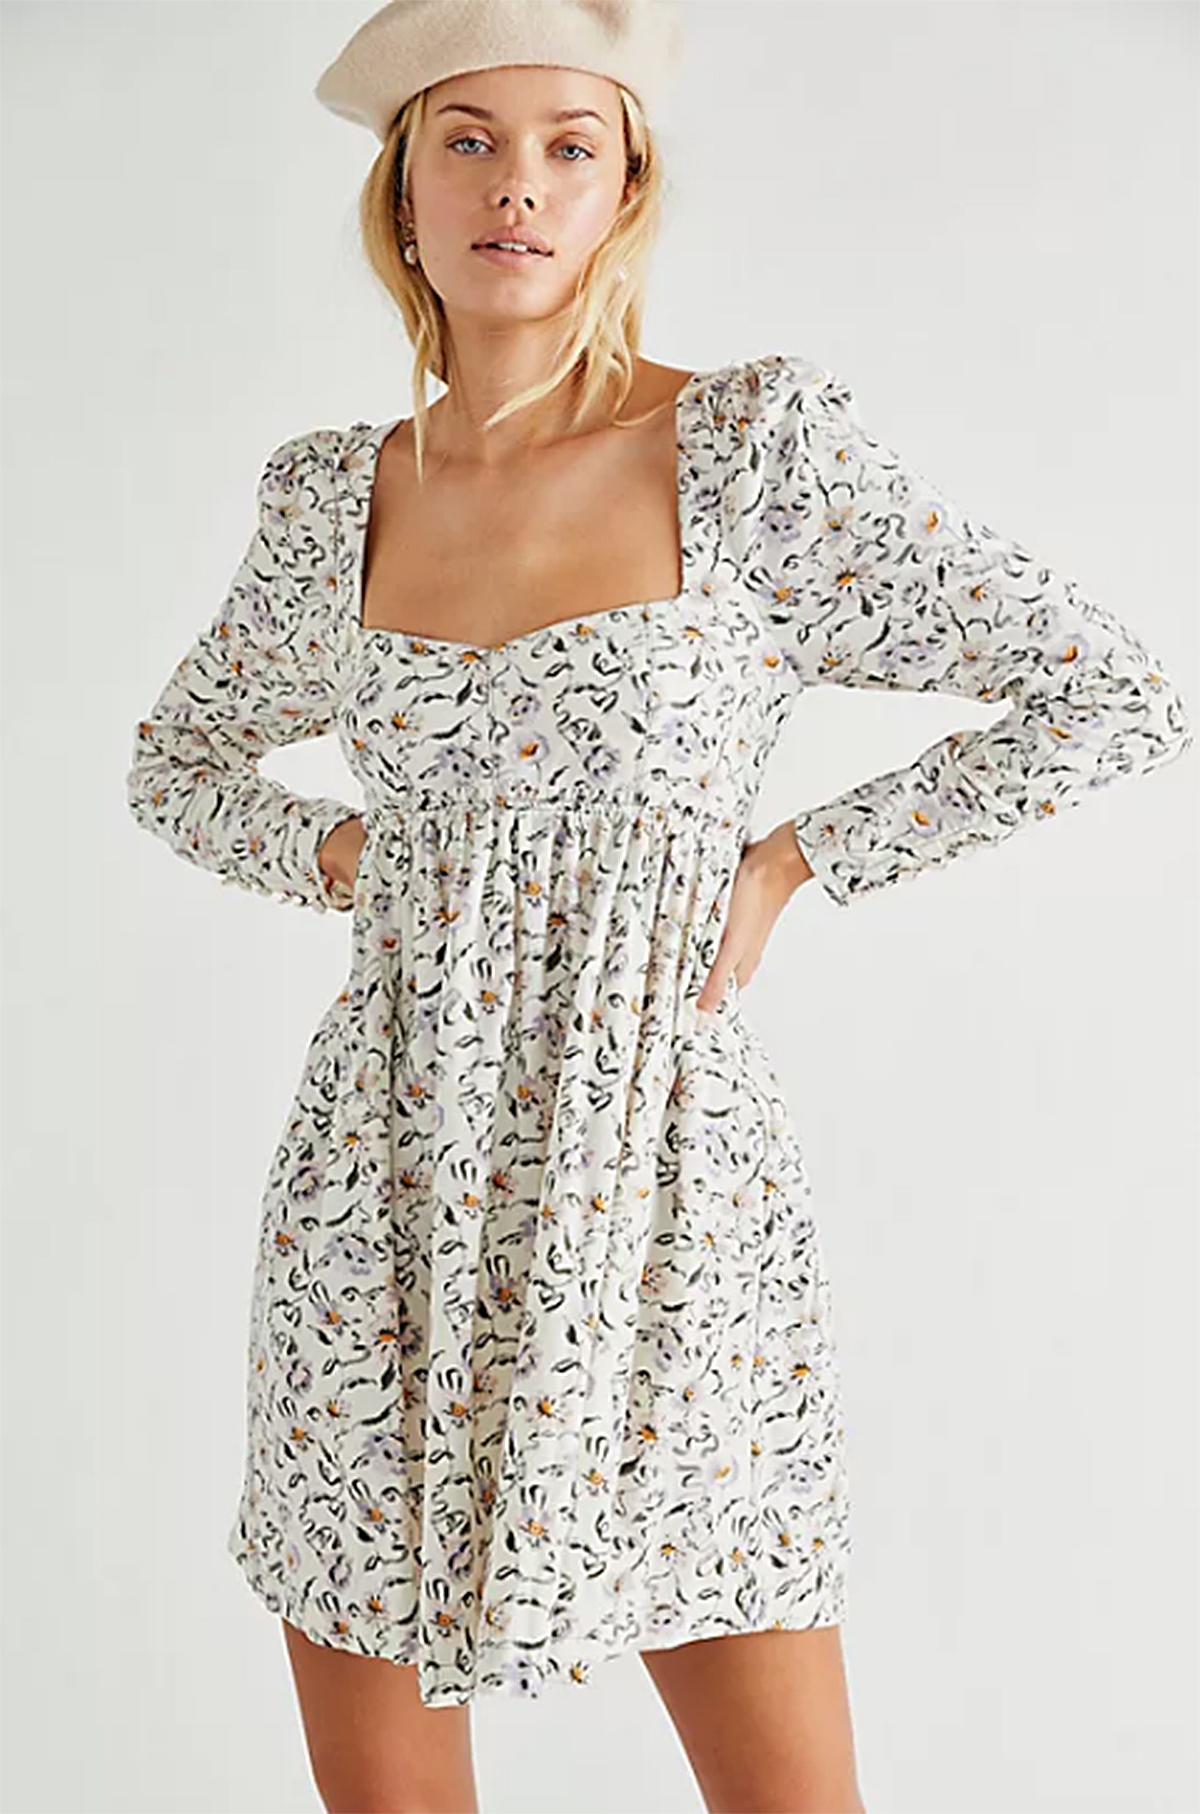 free-people-dress-sale-babydoll-floral